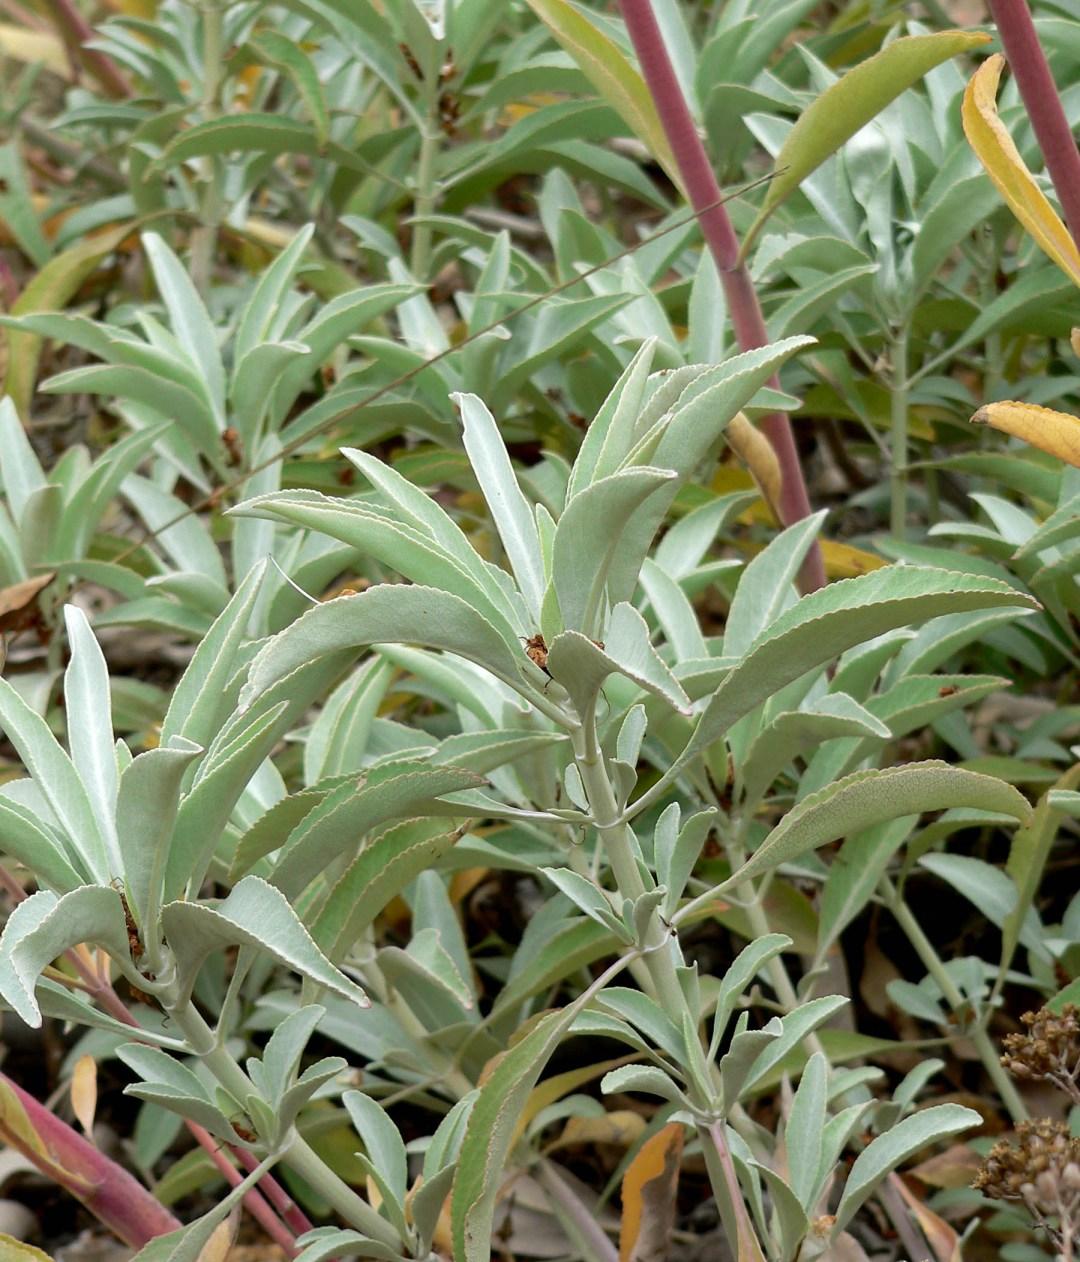 Archivo:Salvia apiana 2.jpg - Wikipedia, la enciclopedia libre